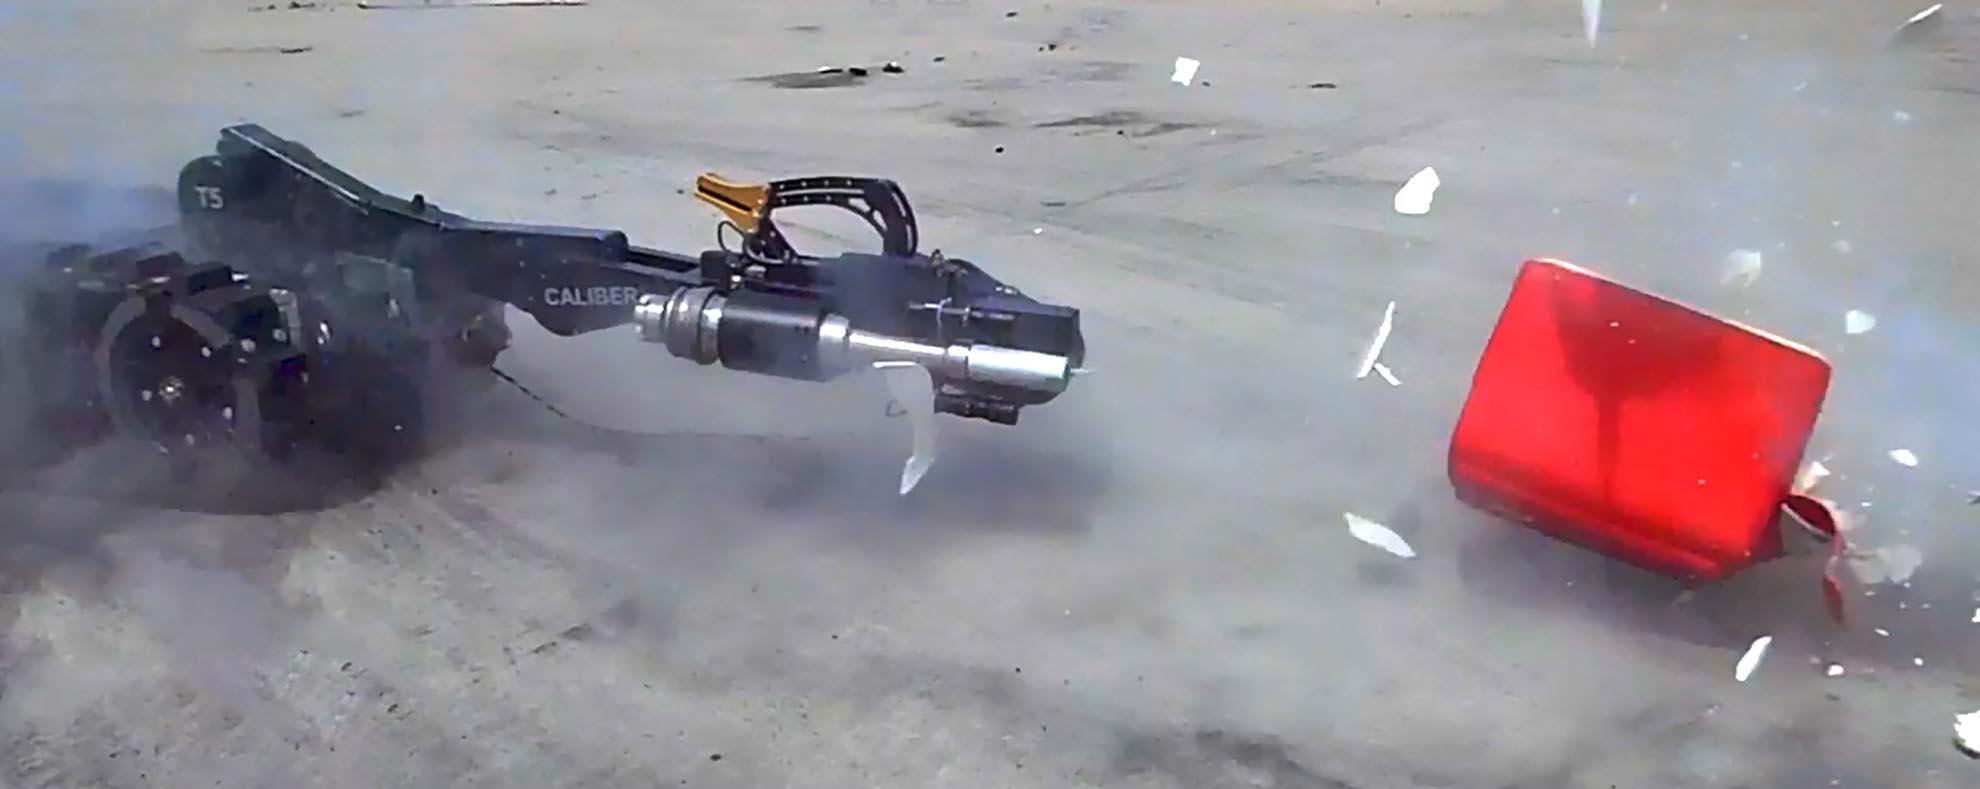 caliber-t5-swat-eod-robot-disrupting-cooler